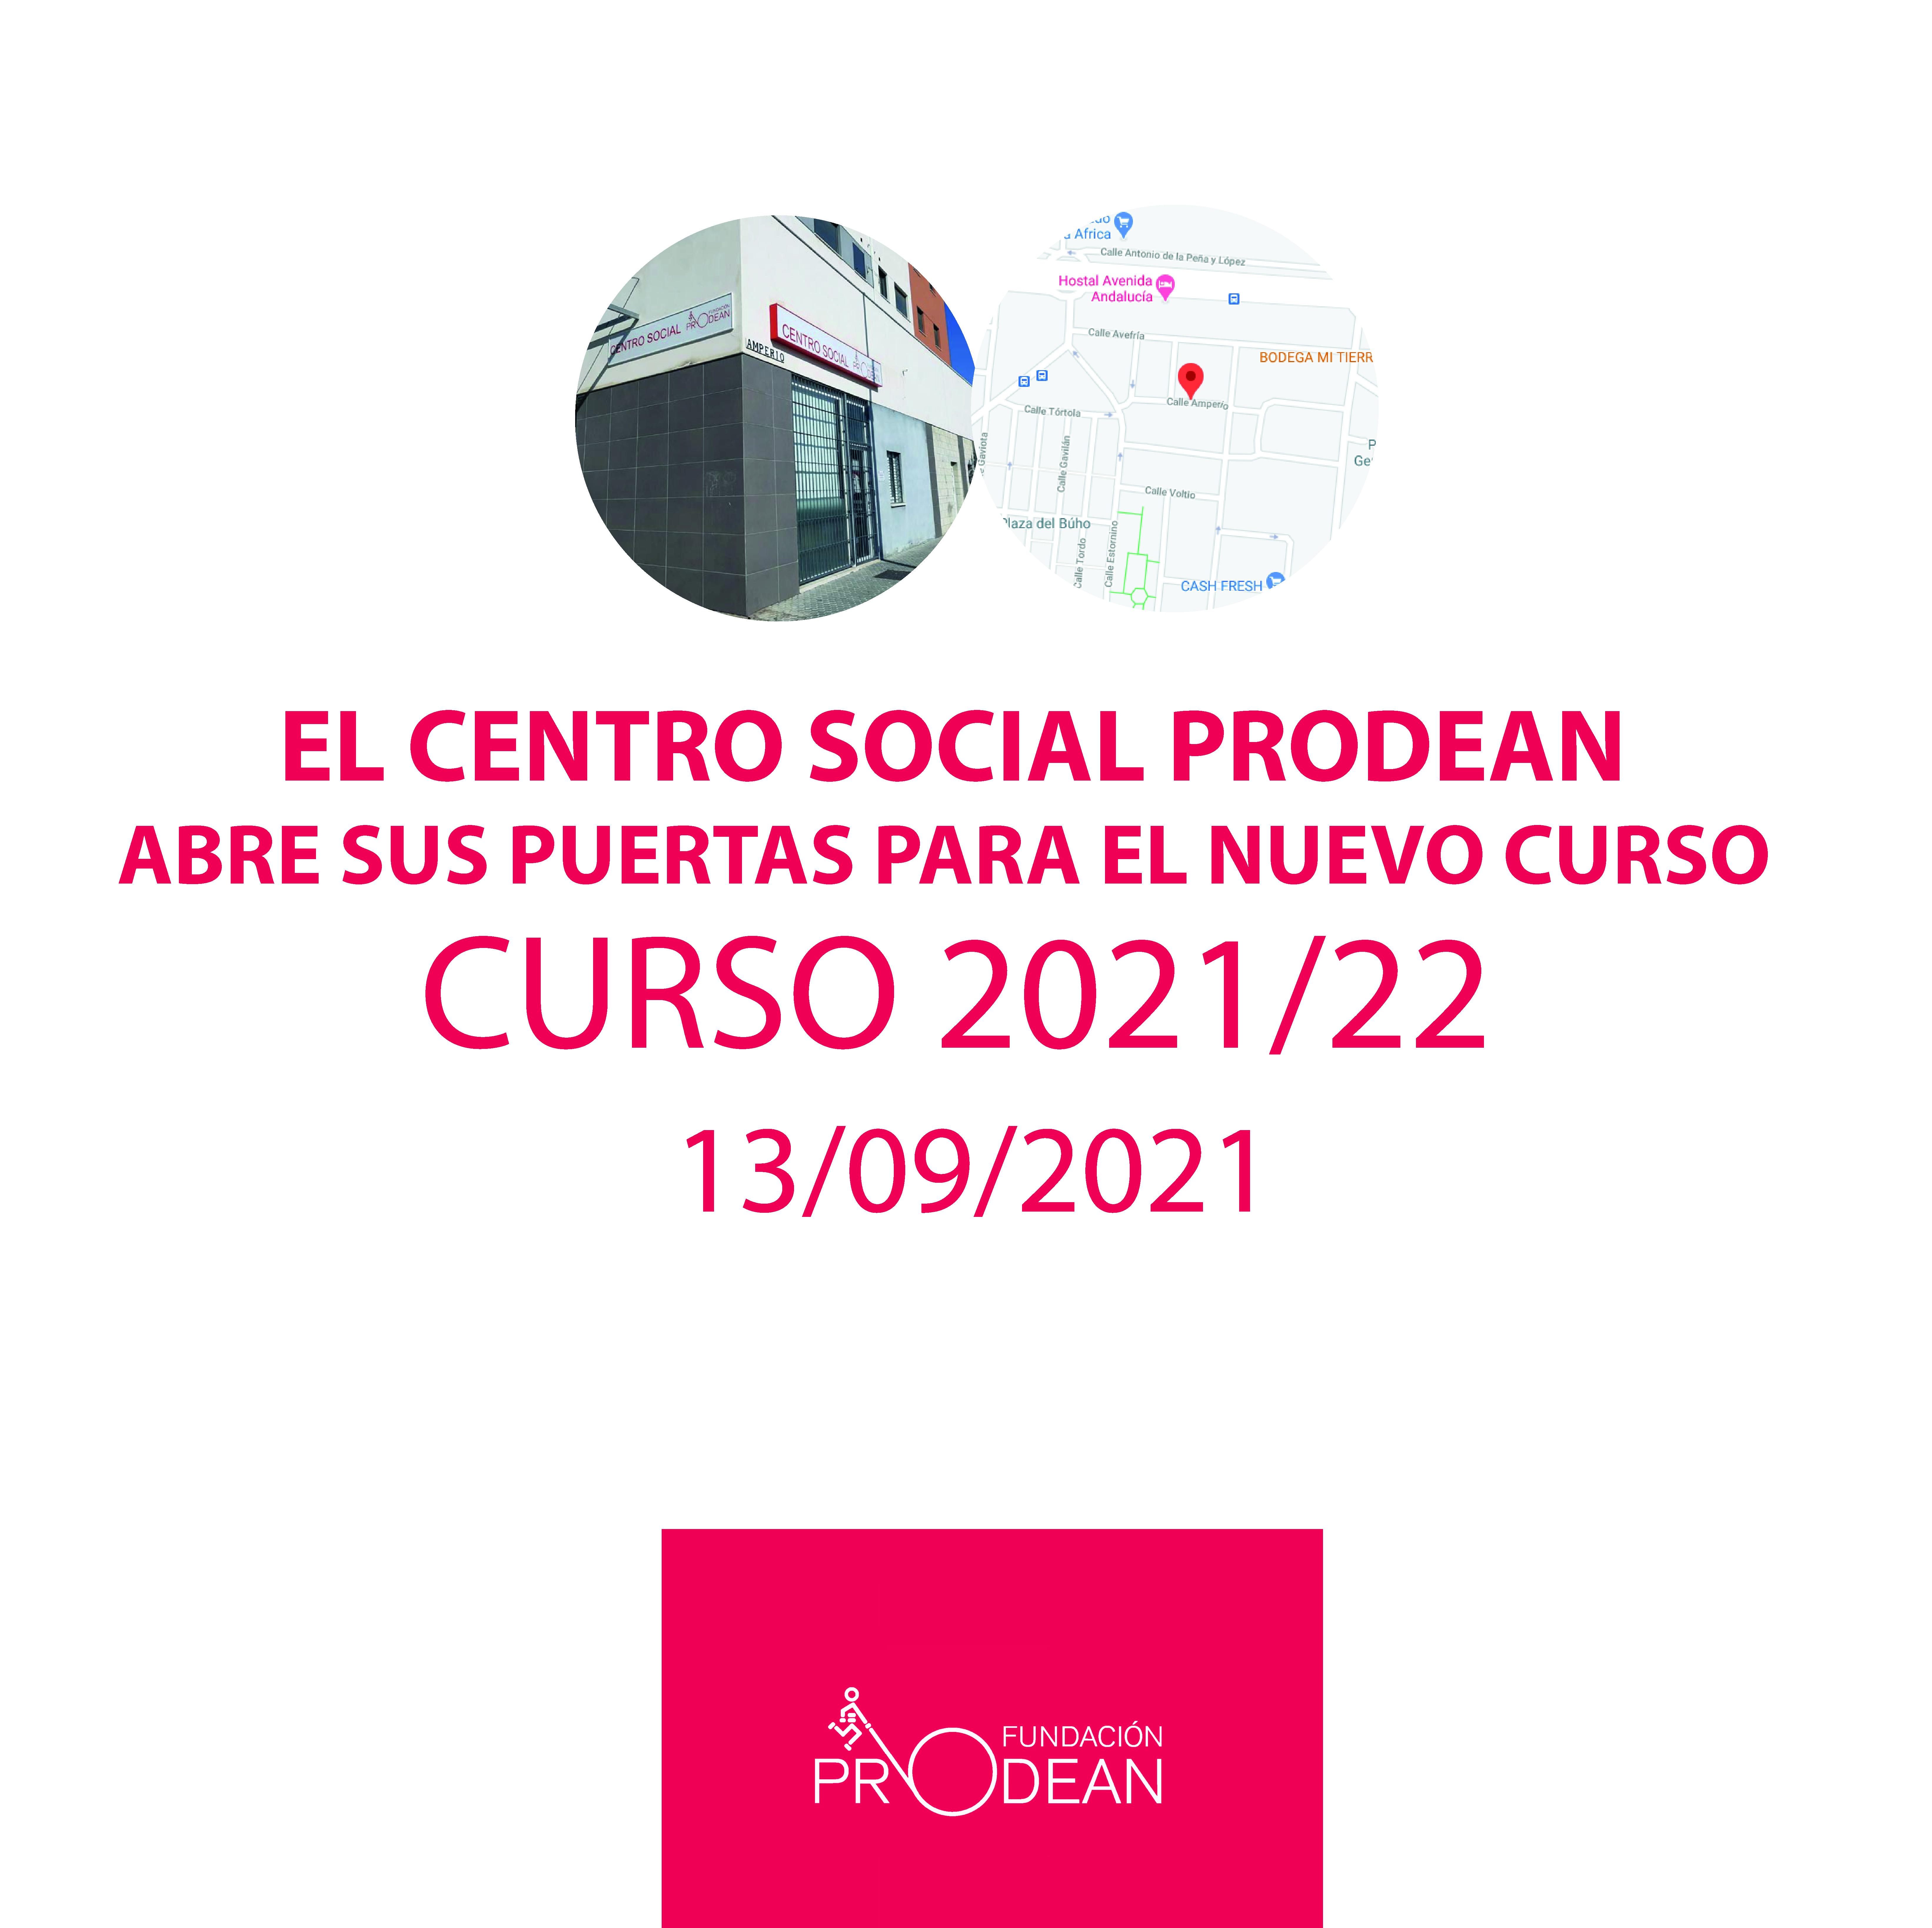 Apertura curso 2021/22 Centro Social Prodean Los Pajaritos acción social Sevilla